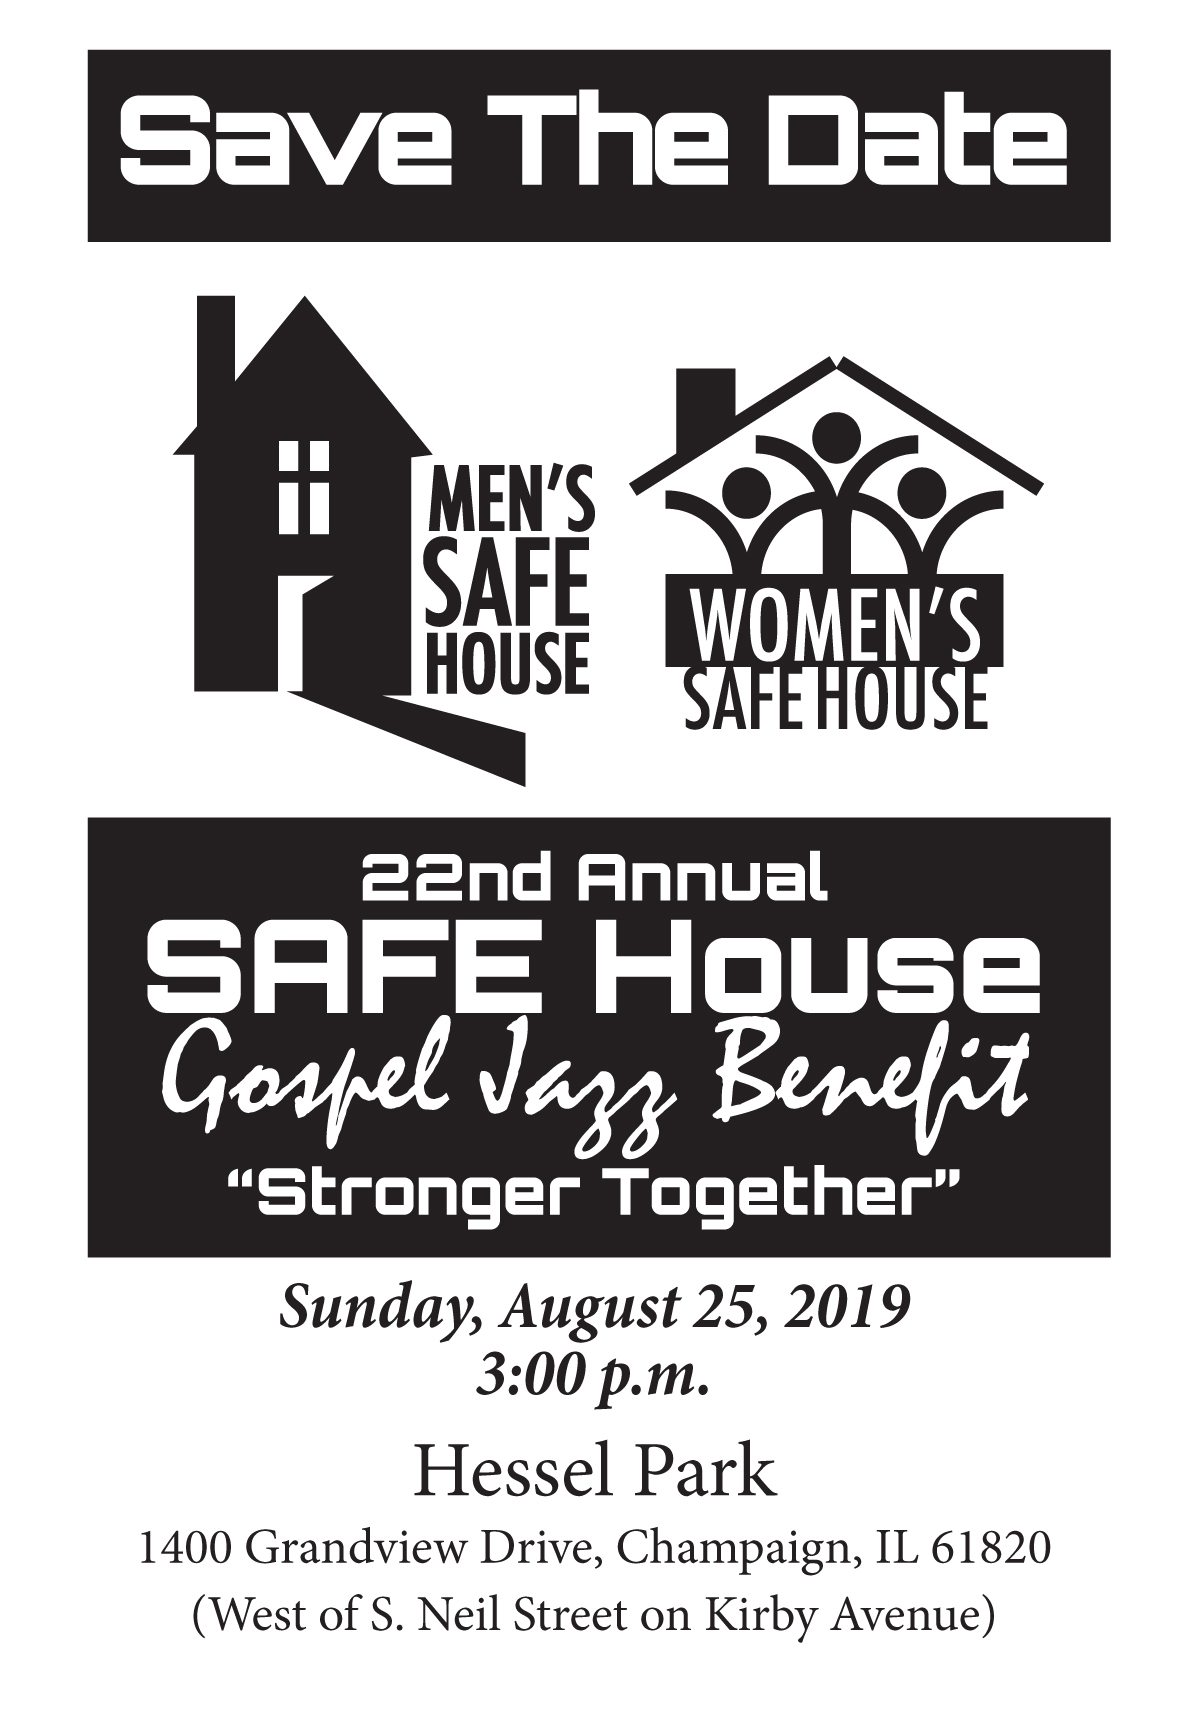 SafeHousesSaveTheDate.2019